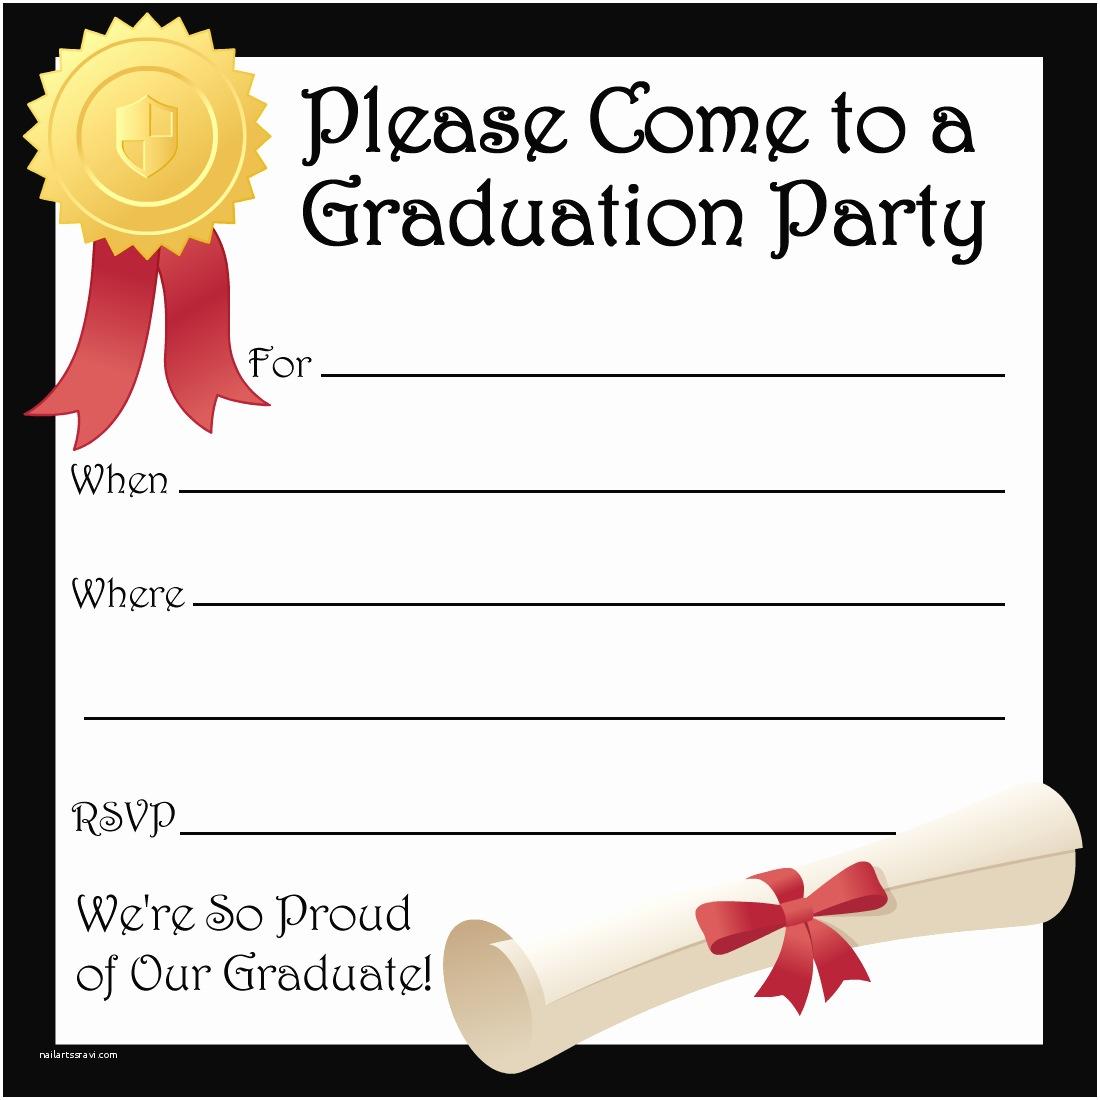 College Graduation Invitation Templates Free Printable Graduation Party Invitations